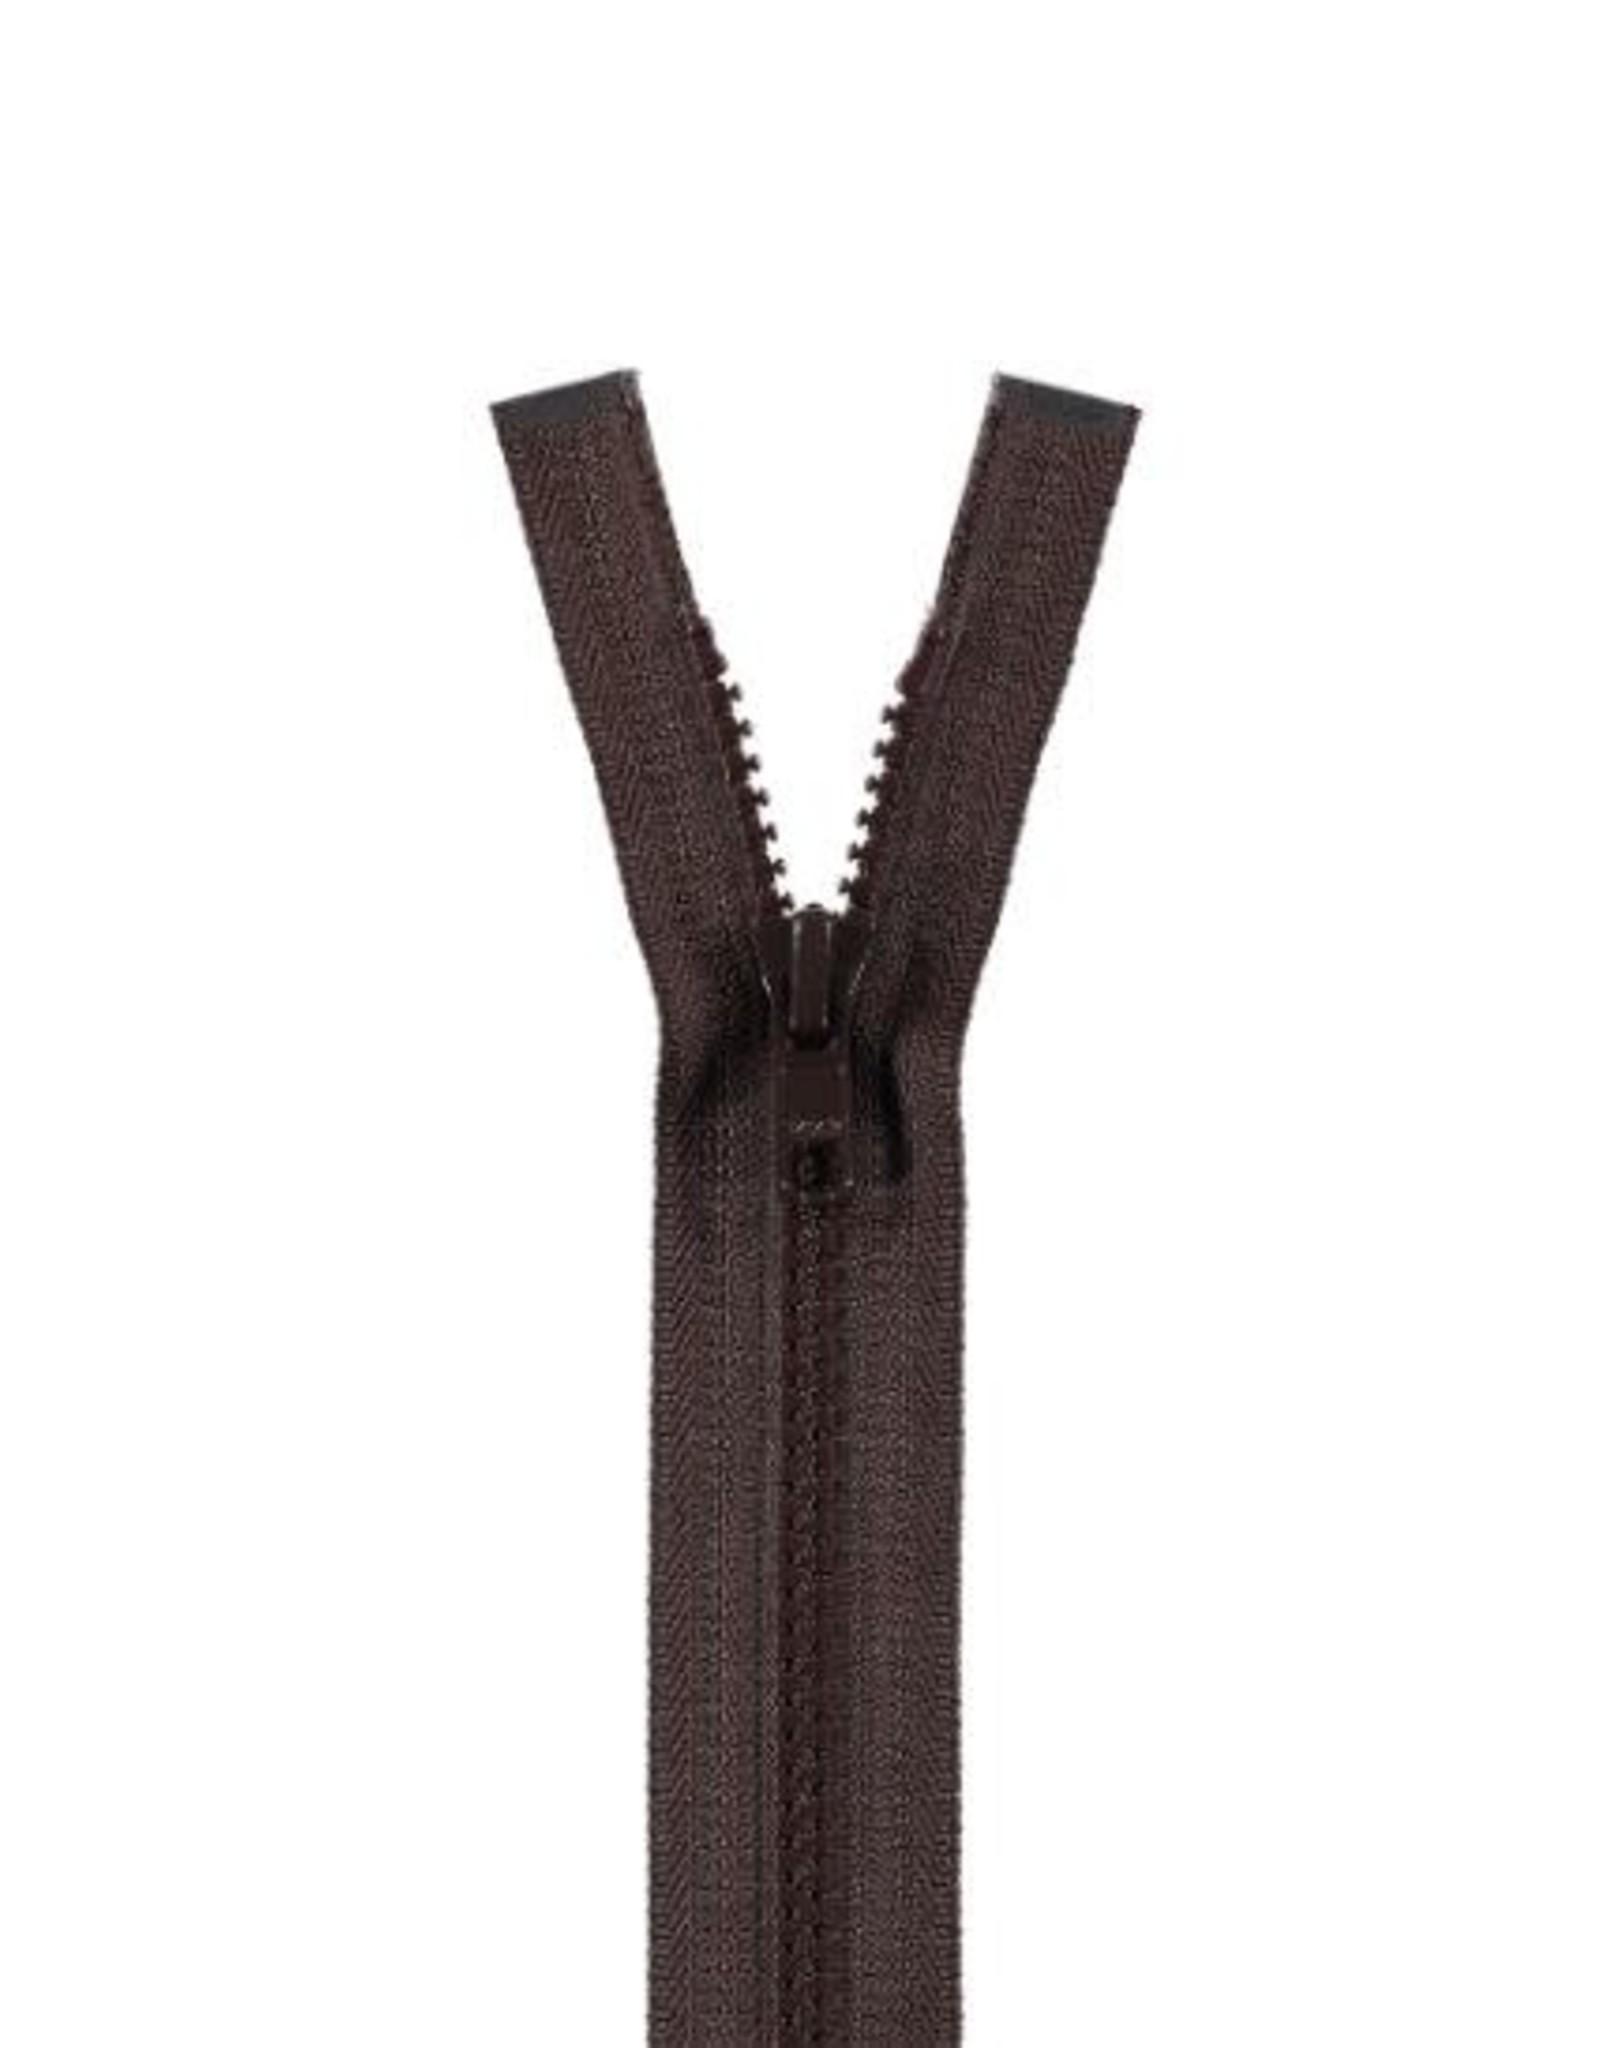 YKK BLOKRITS 5 DEELBAAR bruin 570-80cm